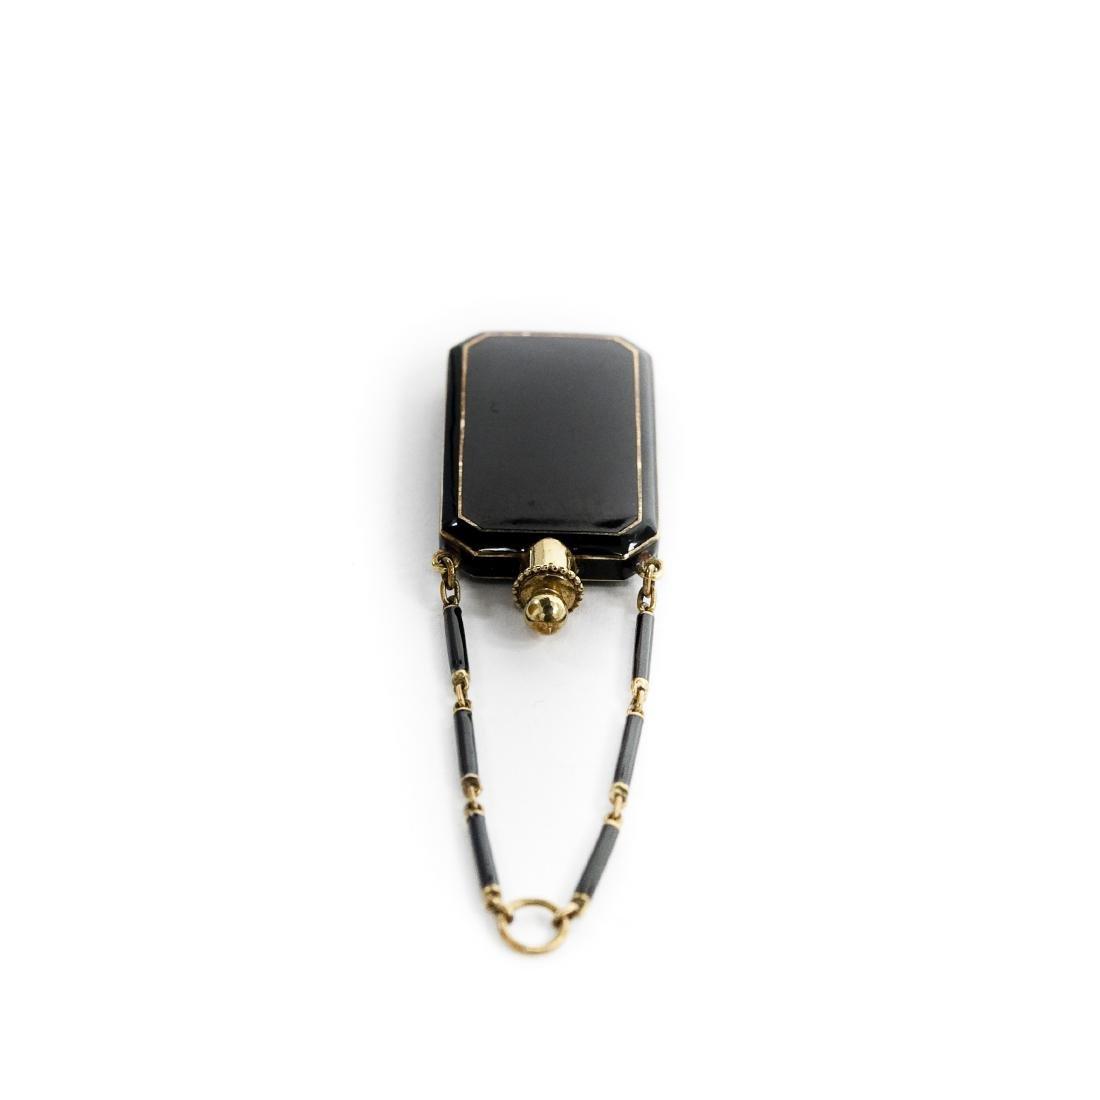 Tiffany & Co. 14K Enameled Perfume bottle/Vinaigrette. - 2